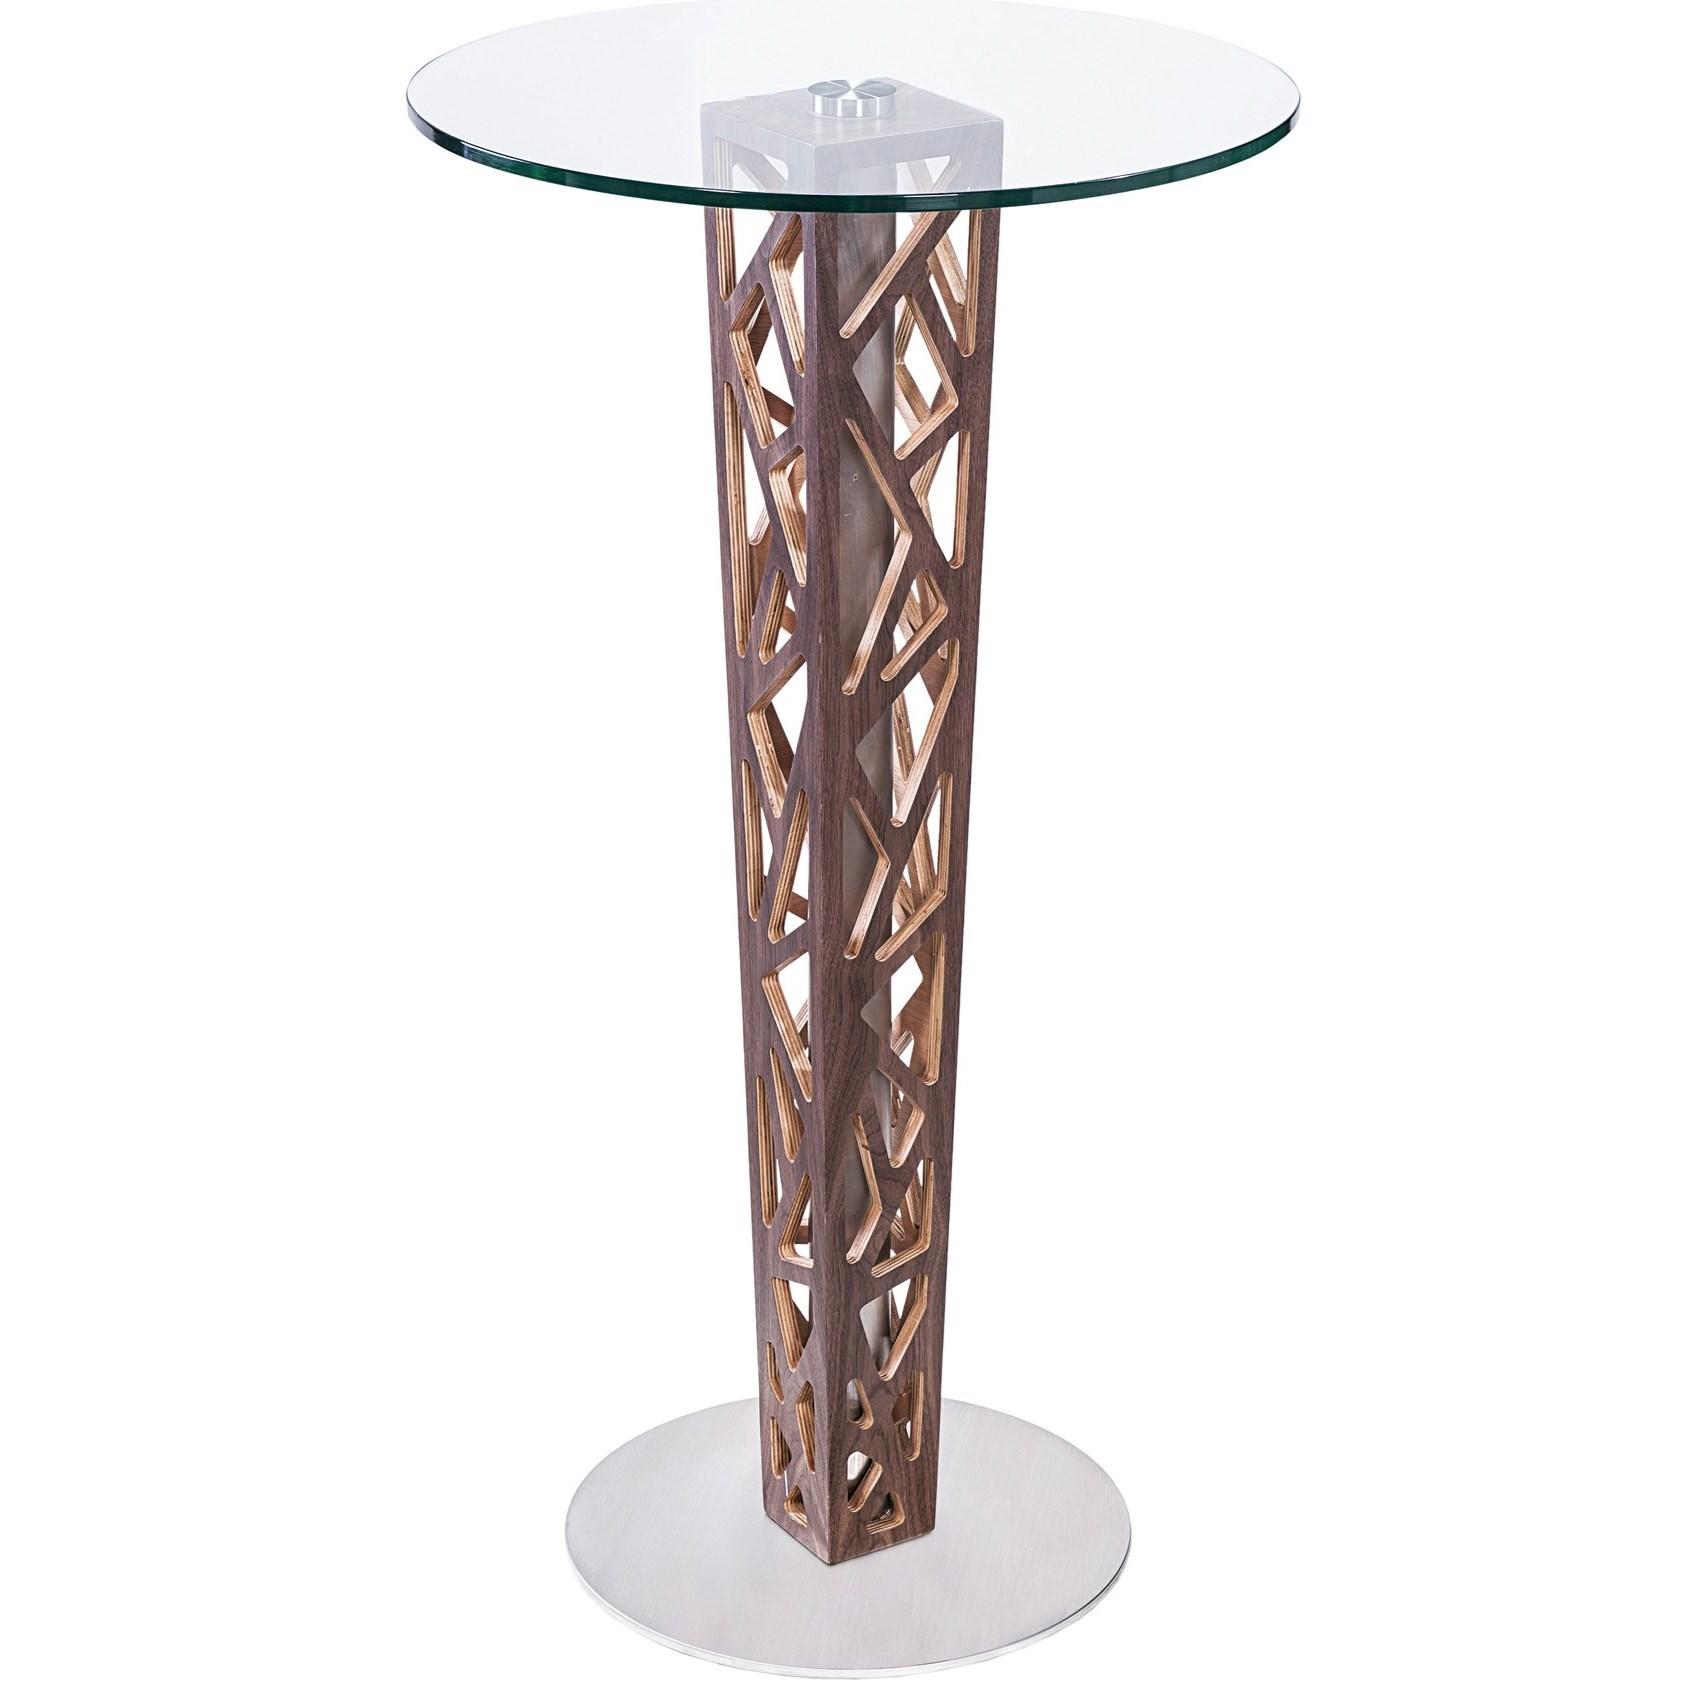 Crystal Bar Table with Walnut Veneer Column at Sadler's Home Furnishings